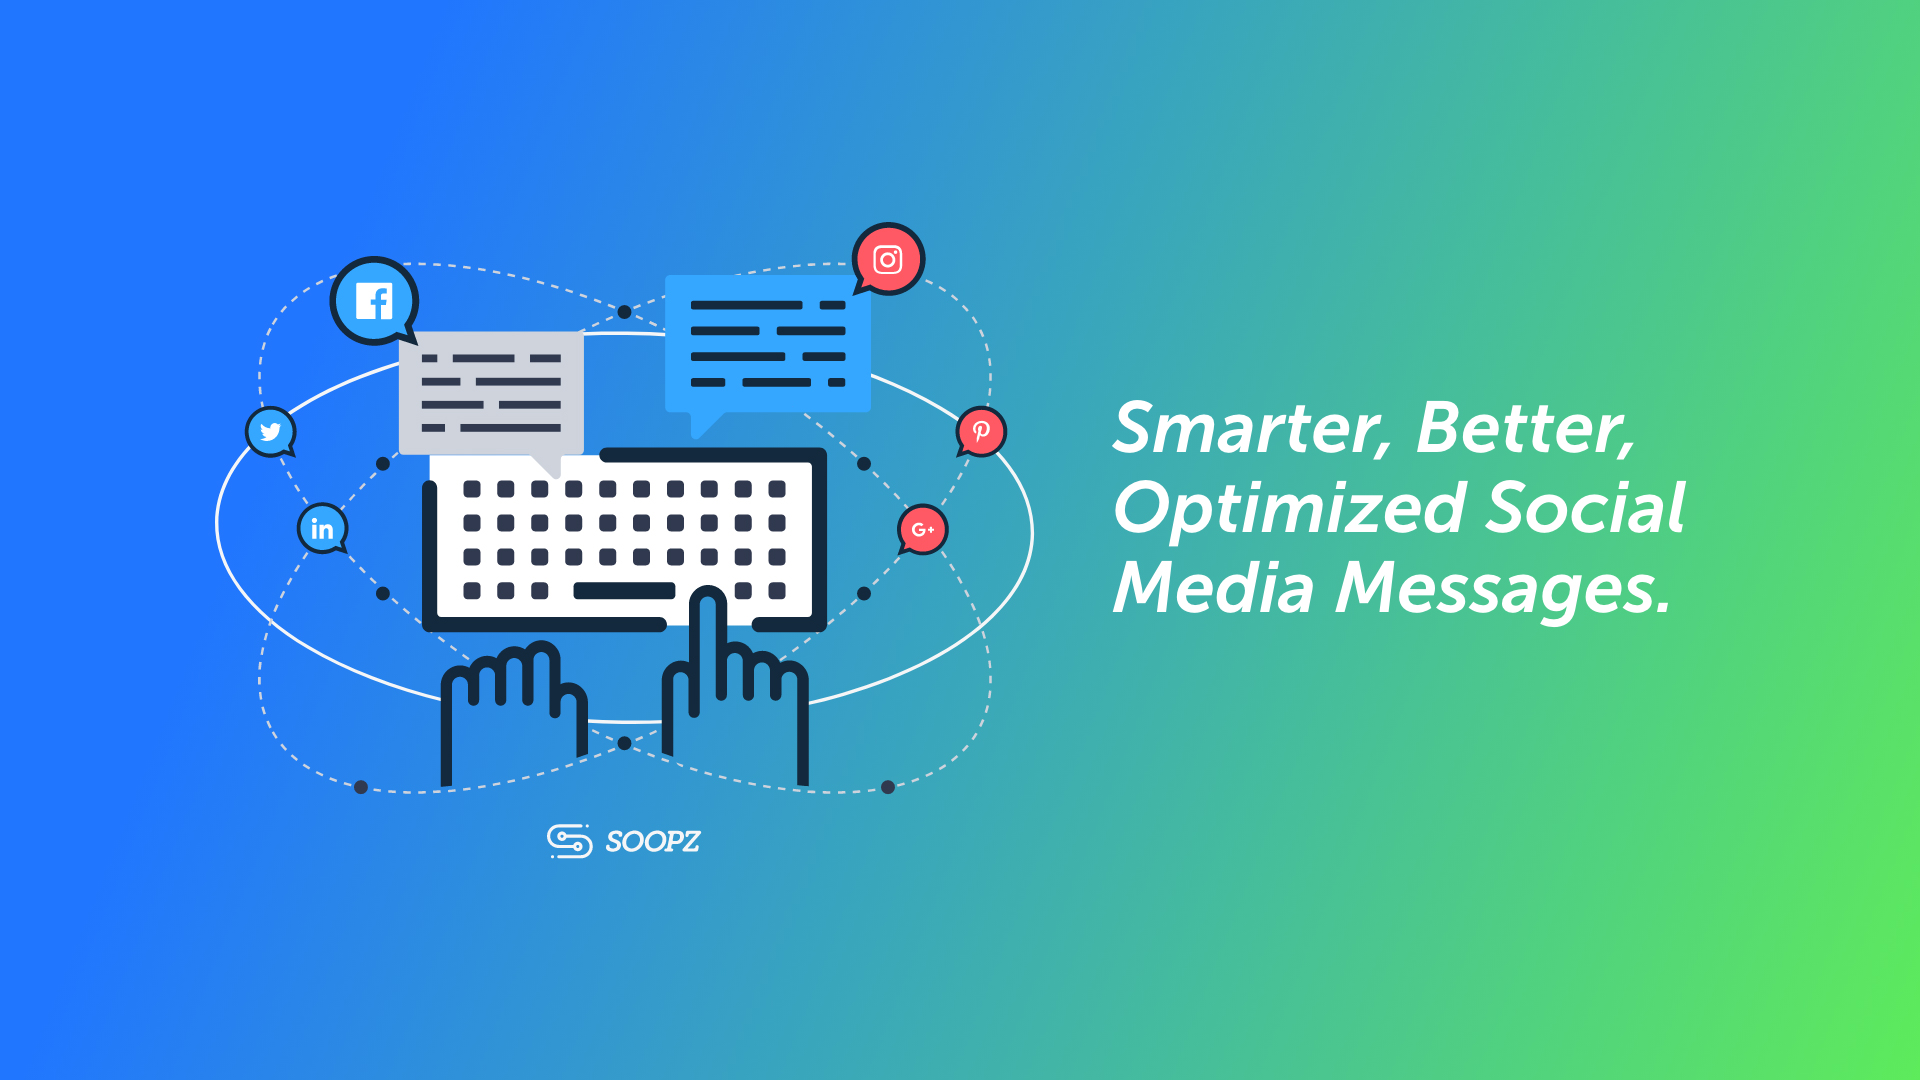 Soopz Social Media Messaging